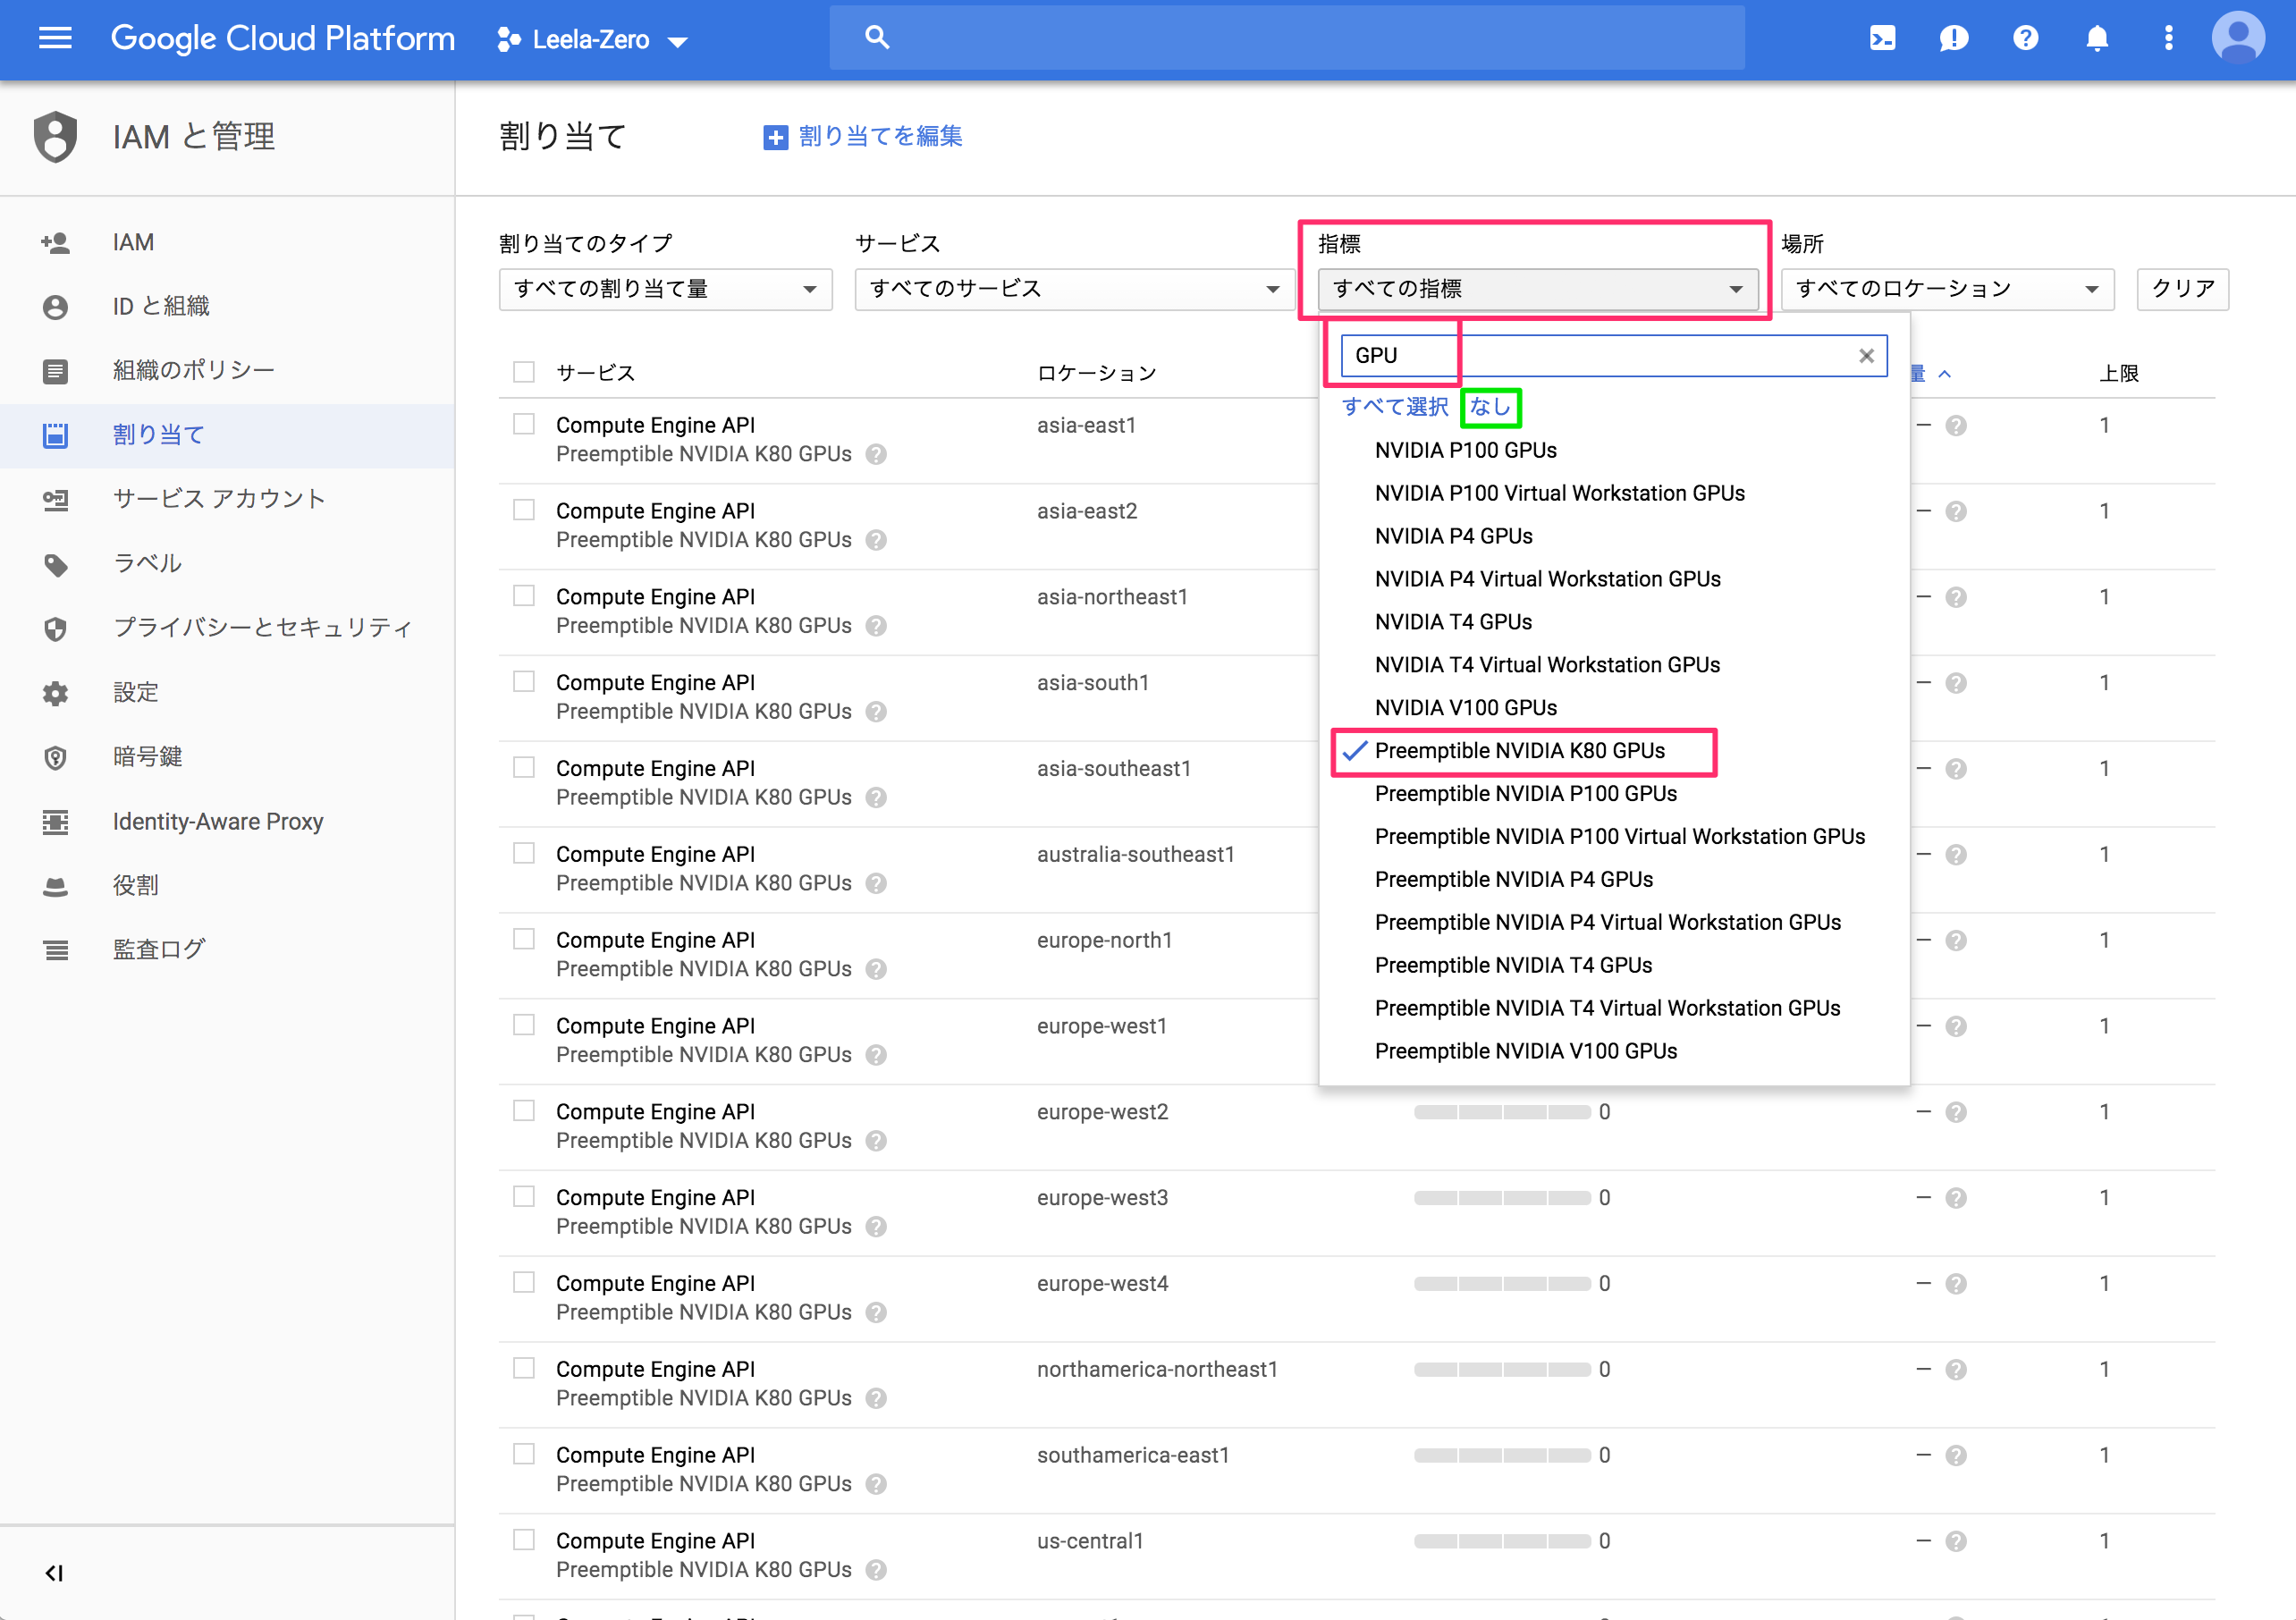 IAM_と管理_-_Leela-Zero_-_Google_Cloud_Platform-2.png